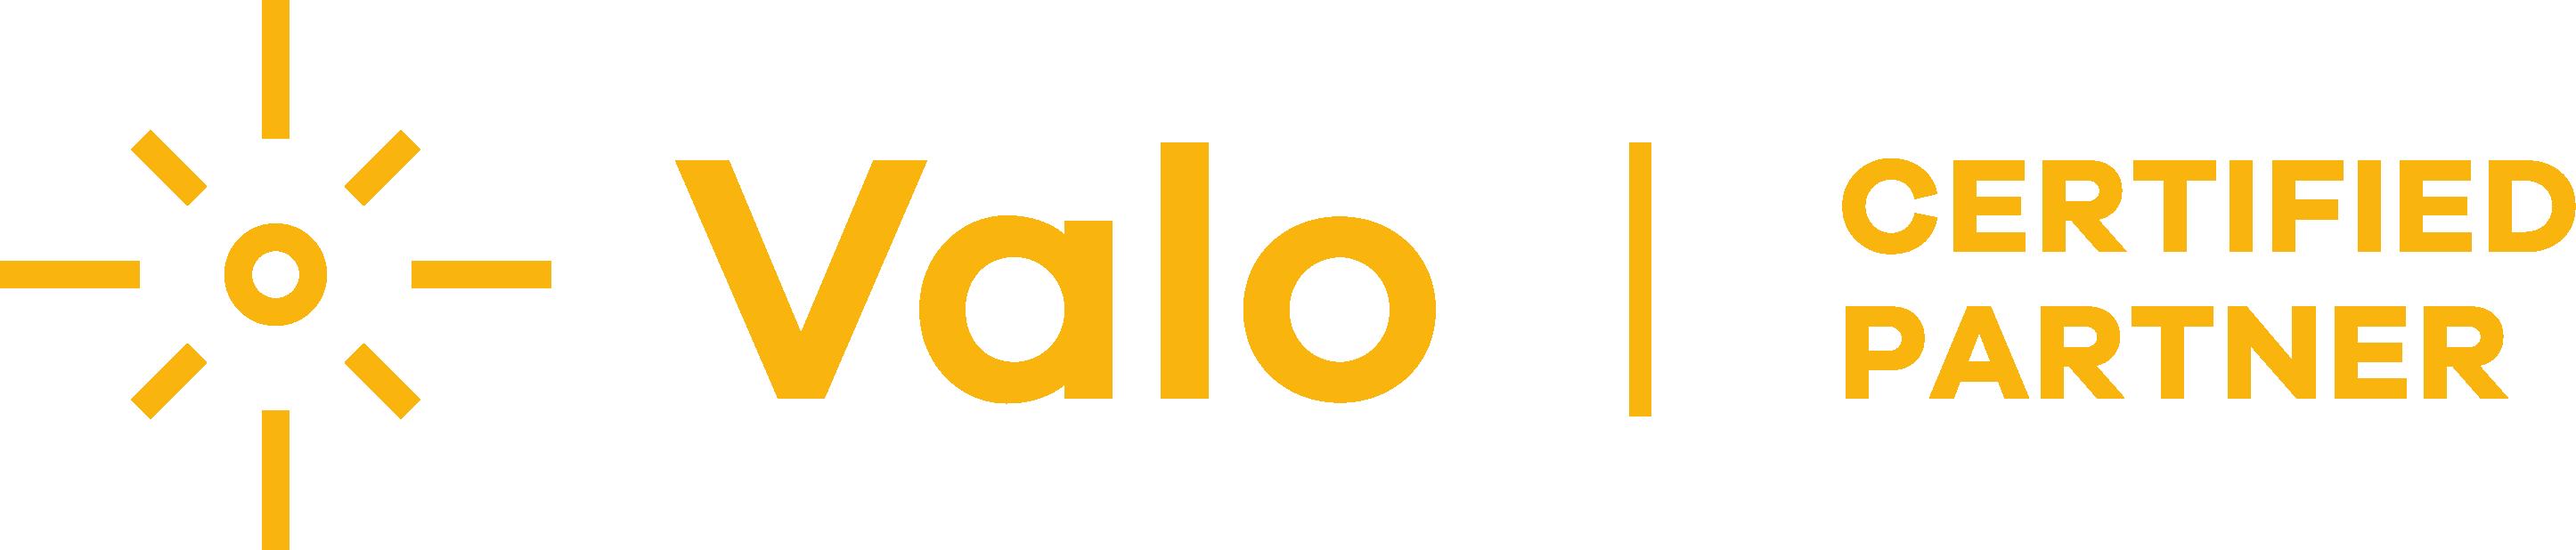 https://digital-touch.de/wp-content/uploads/2020/11/ValoIntranet_CertifiedPartner_Yellow_RGB-1.png